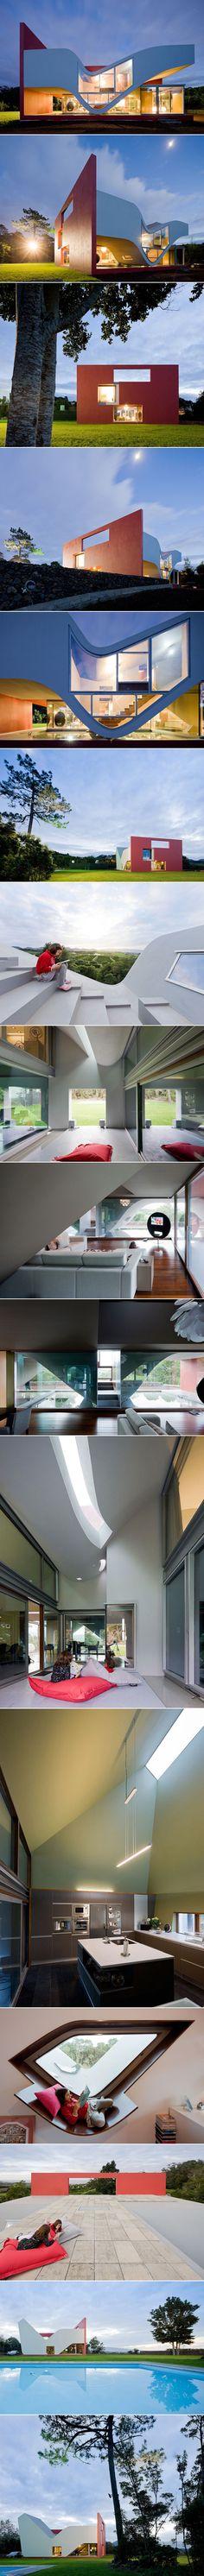 House on the Flight of Birds by Bernardo Rodrigues